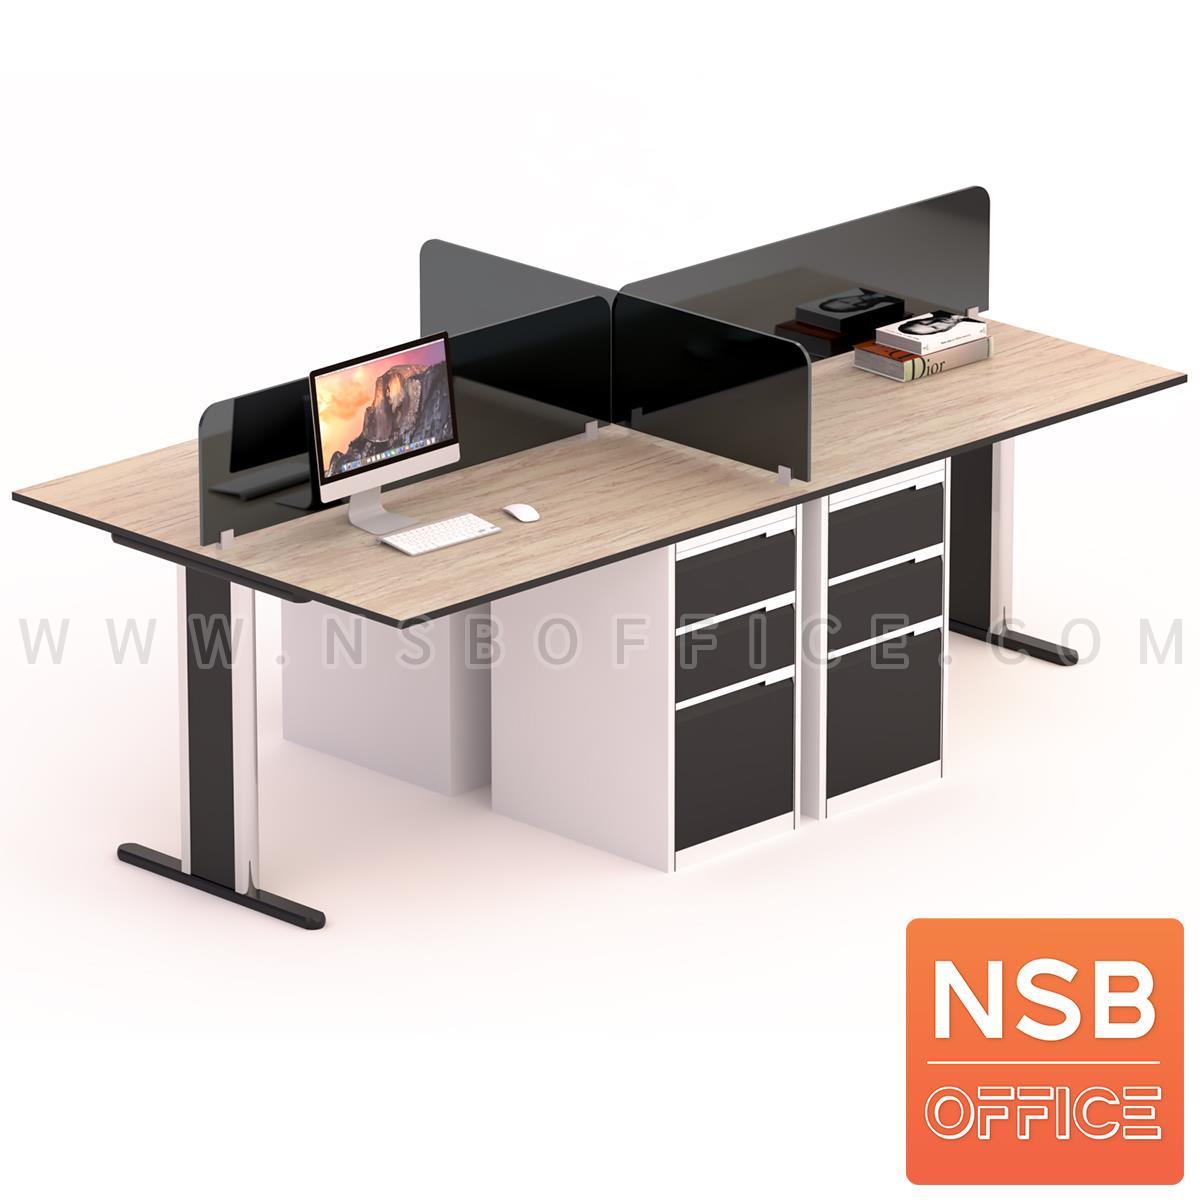 A27A001:ชุดโต๊ะทำงานกลุ่ม 4 ที่นั่ง  รุ่น WS024G  ขนาด 240W ,360W cm. พร้อมมินิสกรีนกระจกและลิ้นชัก ขาเหล็ก